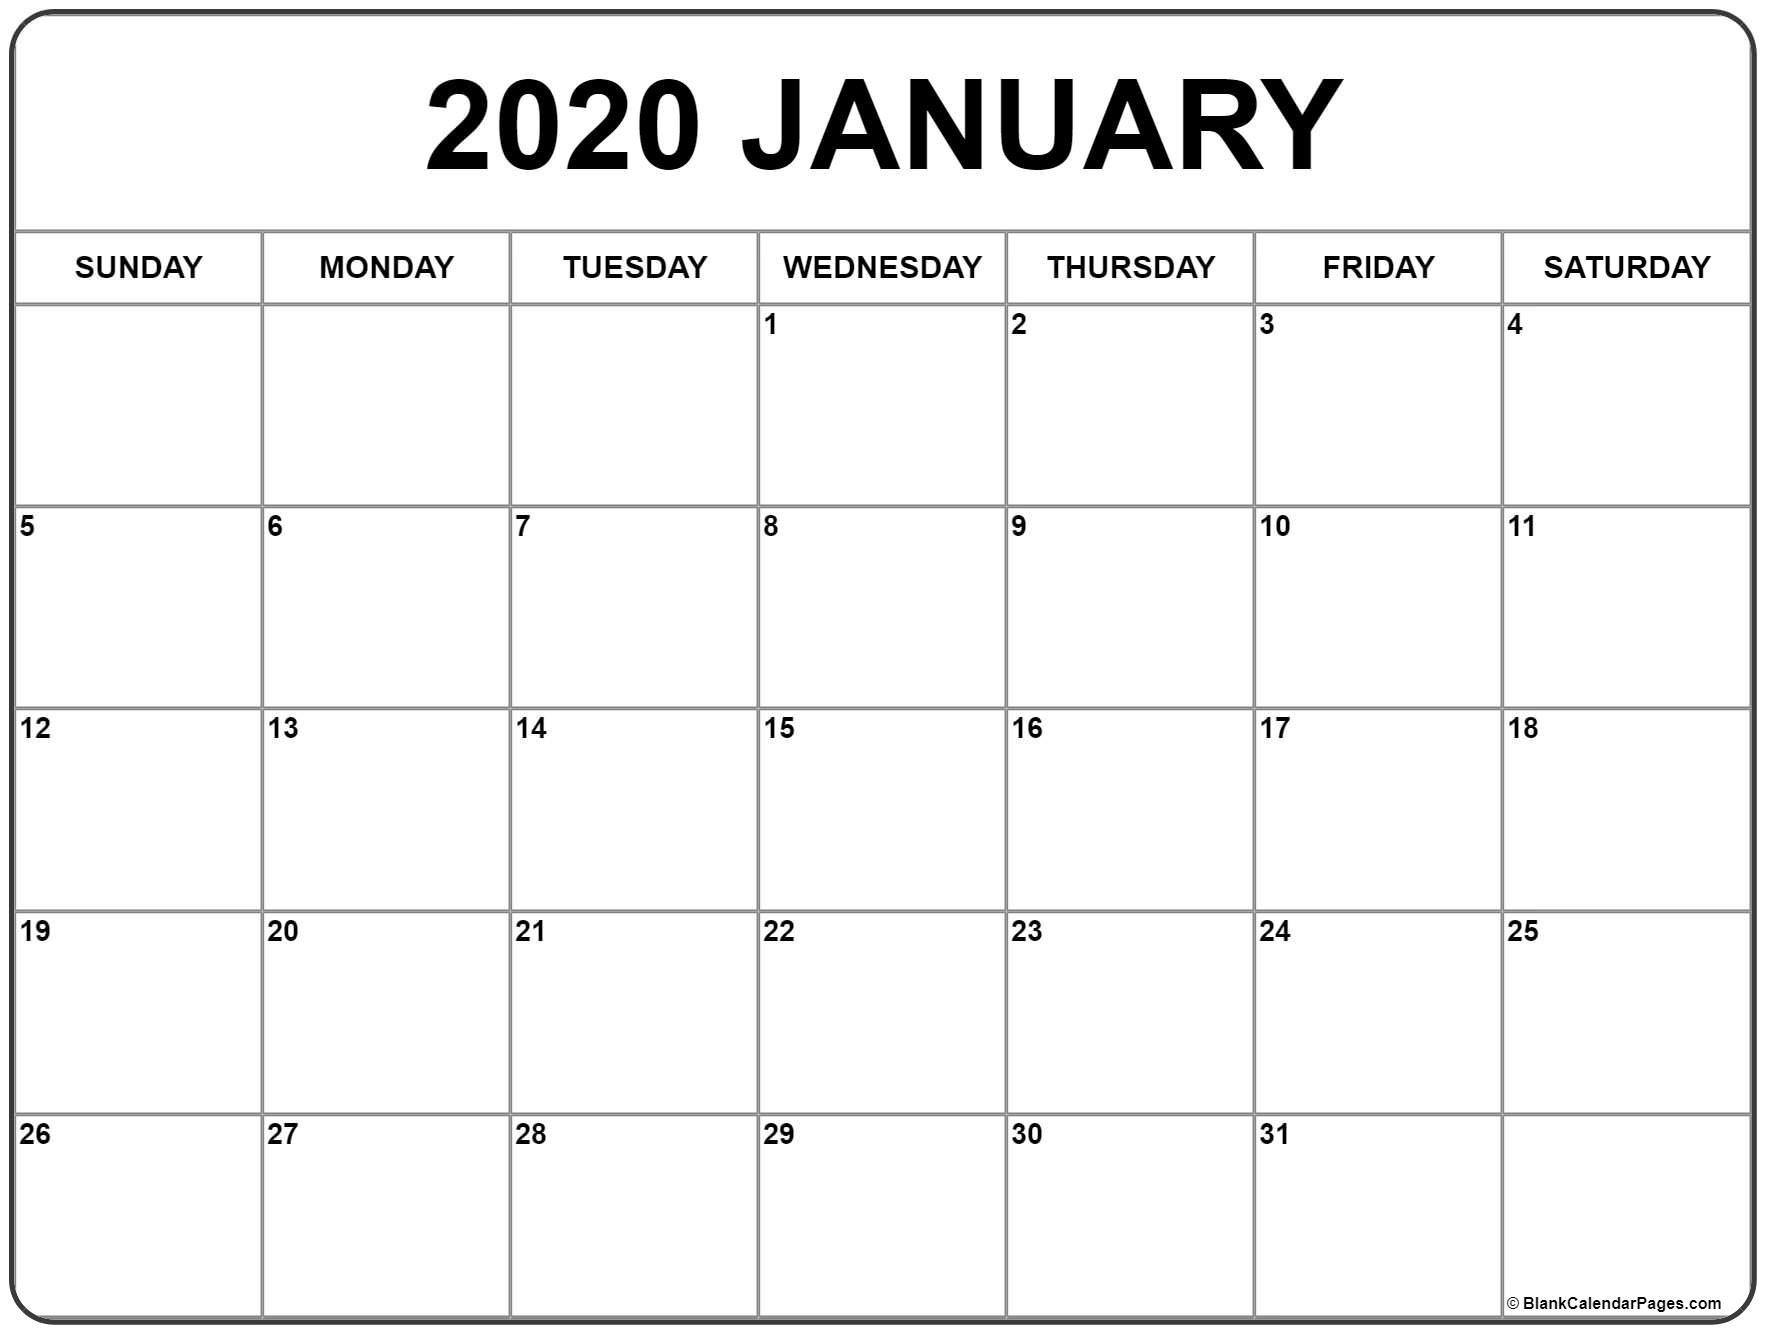 January 2020 Calendar | Free Printable Monthly Calendars  Blank Calendar 2020